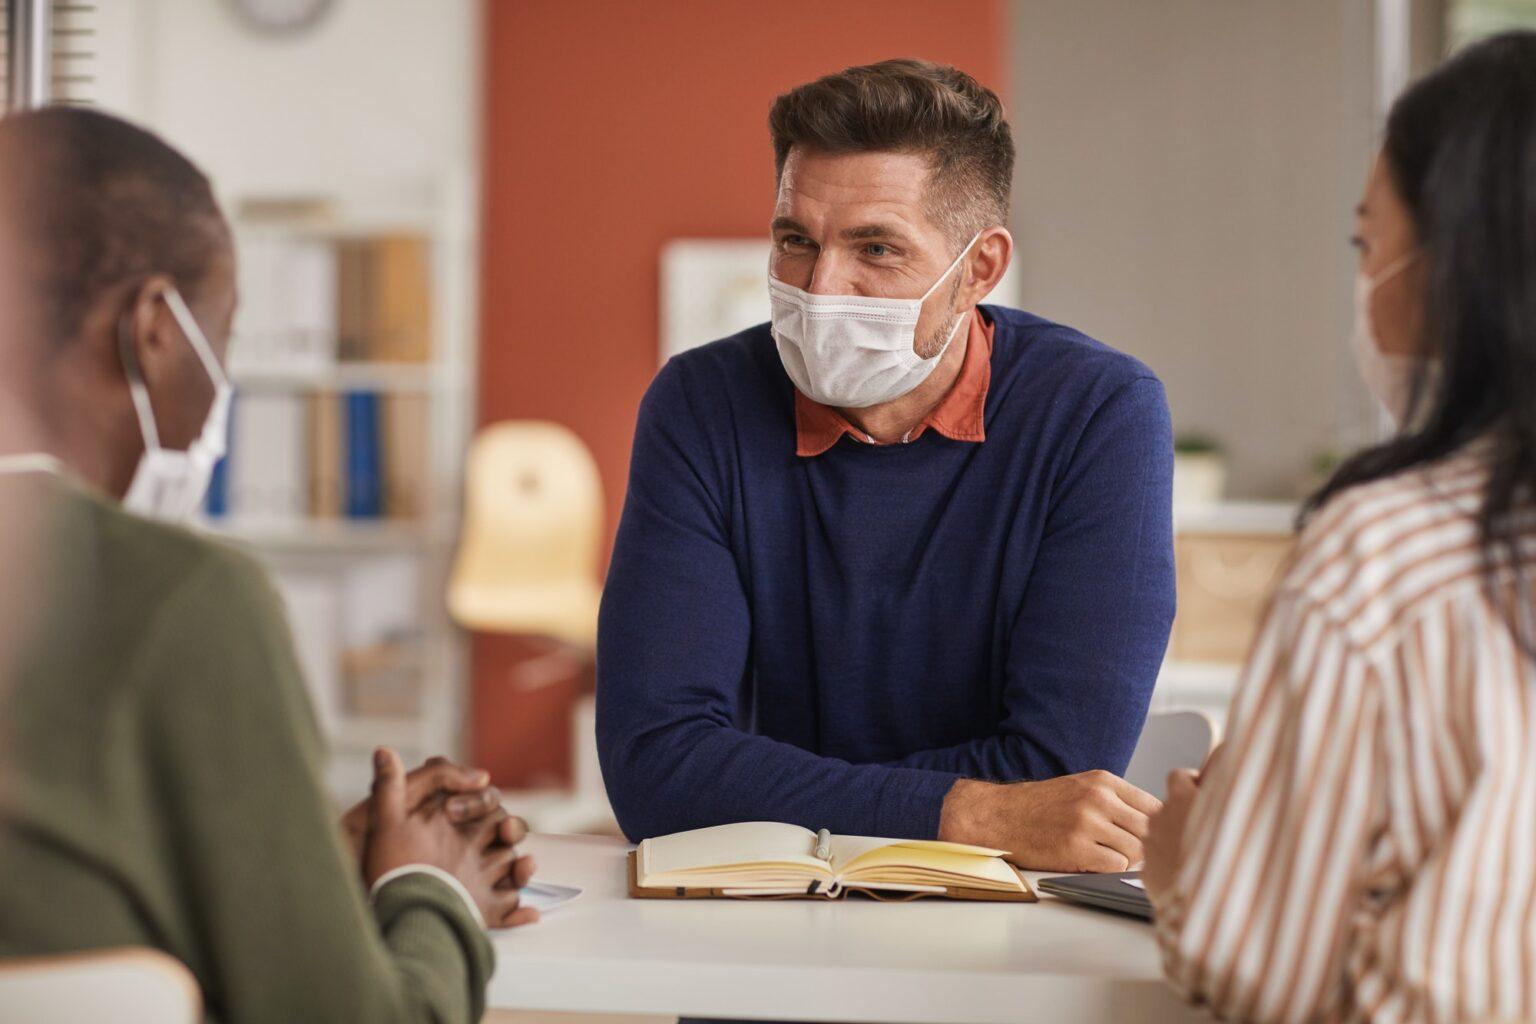 People Wearing Masks in Business Meeting